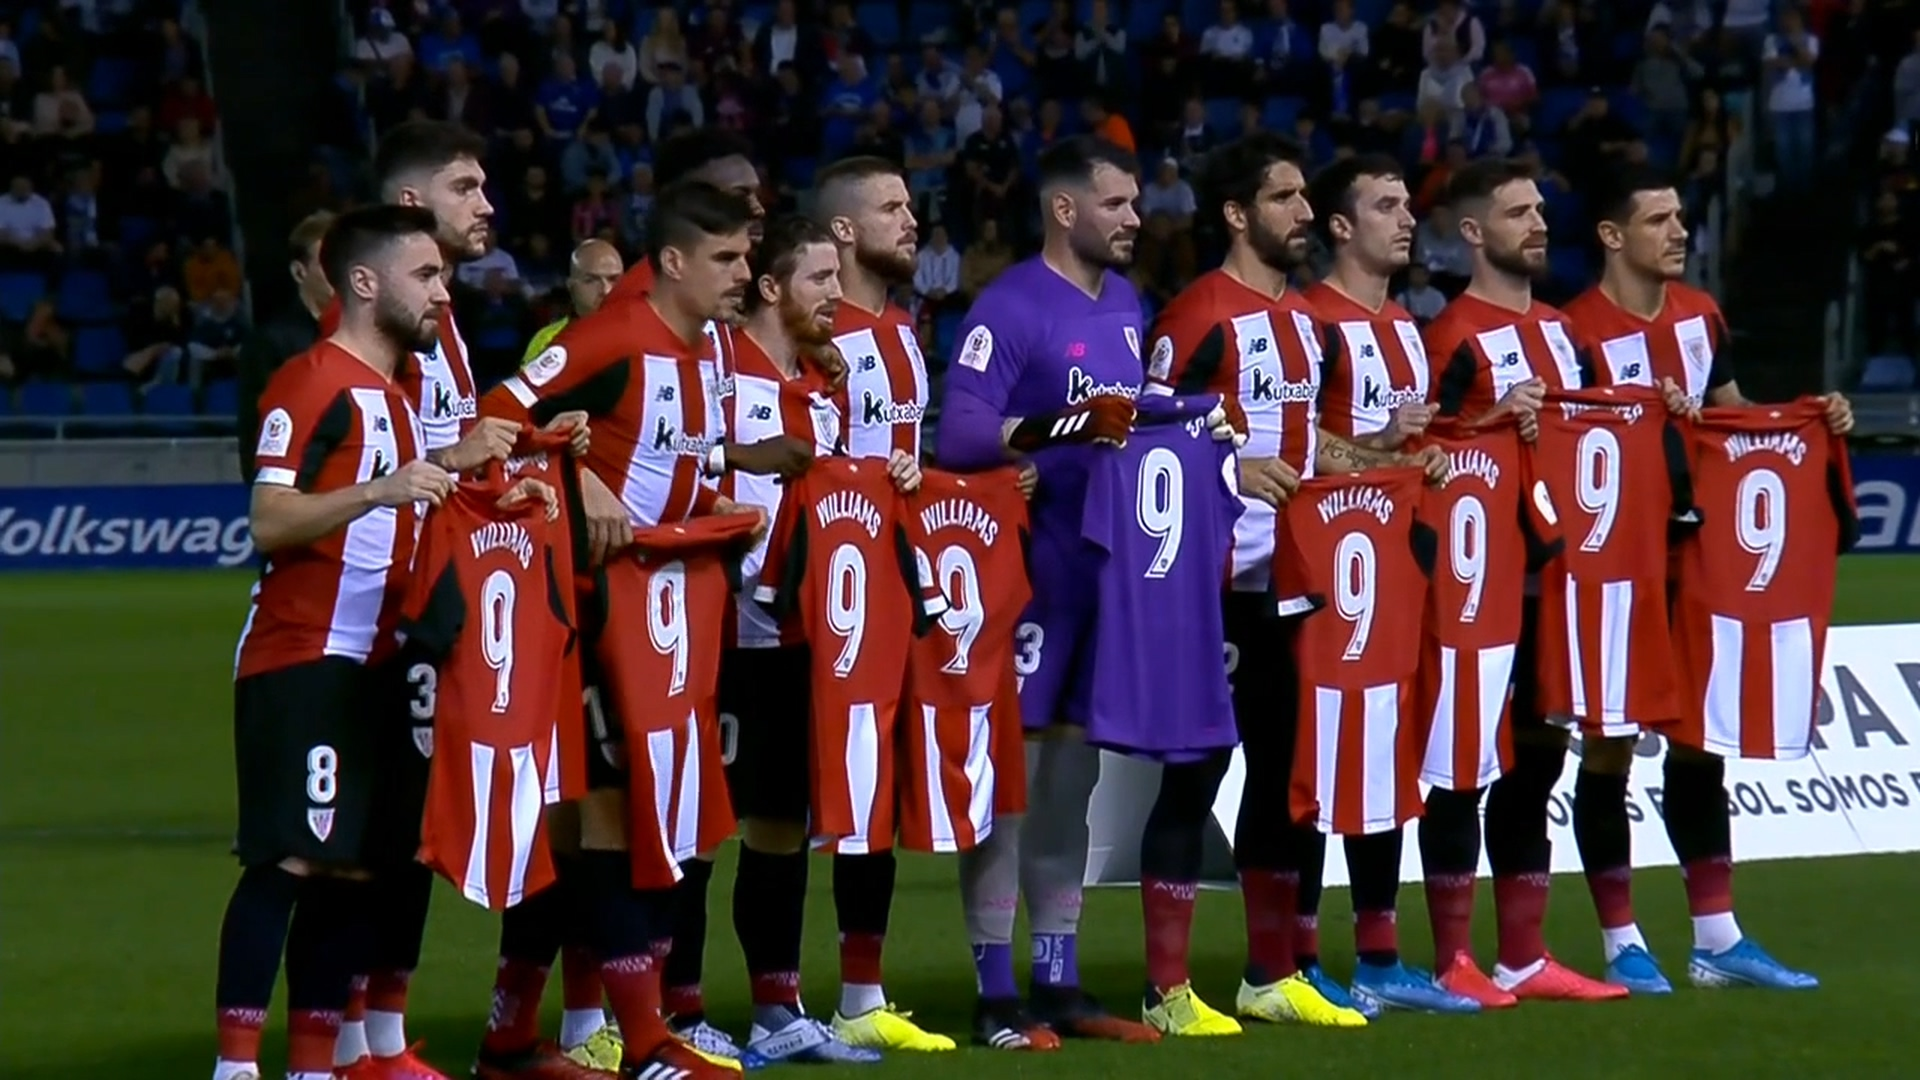 Copa del Rey 19/20 R16 - Tenerife vs Athletic Club Bilbao ...